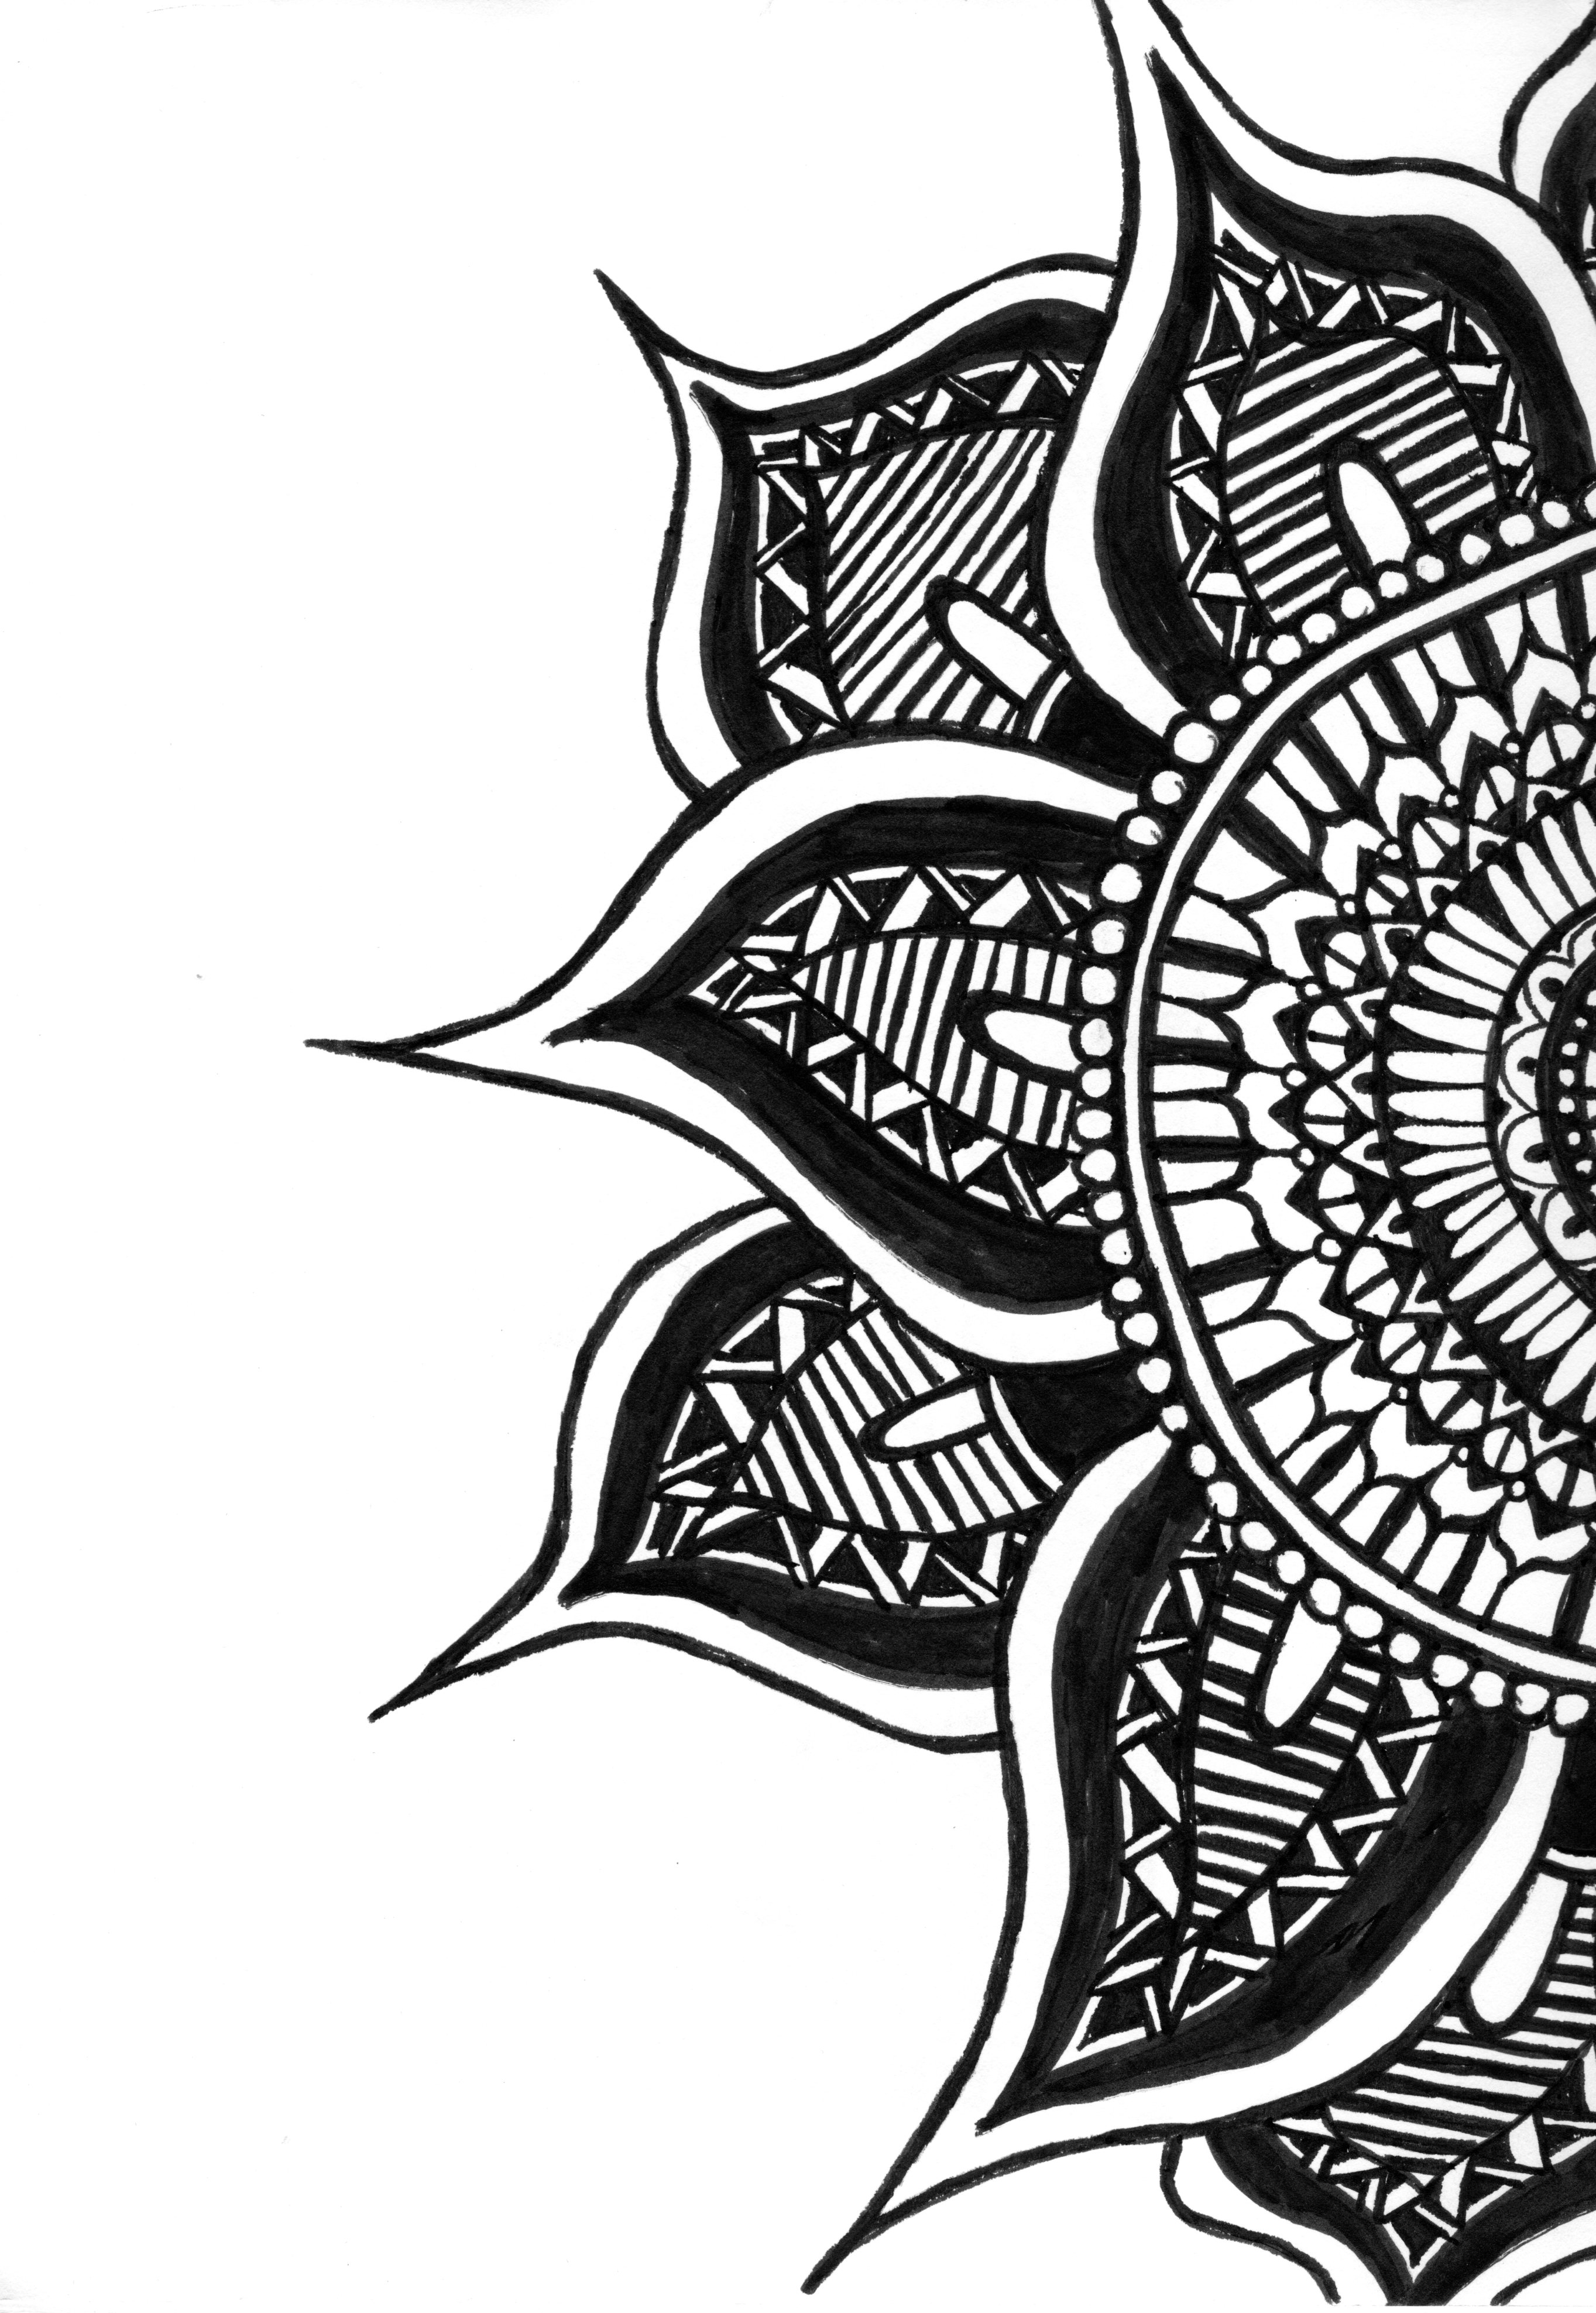 Line Art T Shirt Design : Half flower t shirt design by laurenhascombusted on deviantart